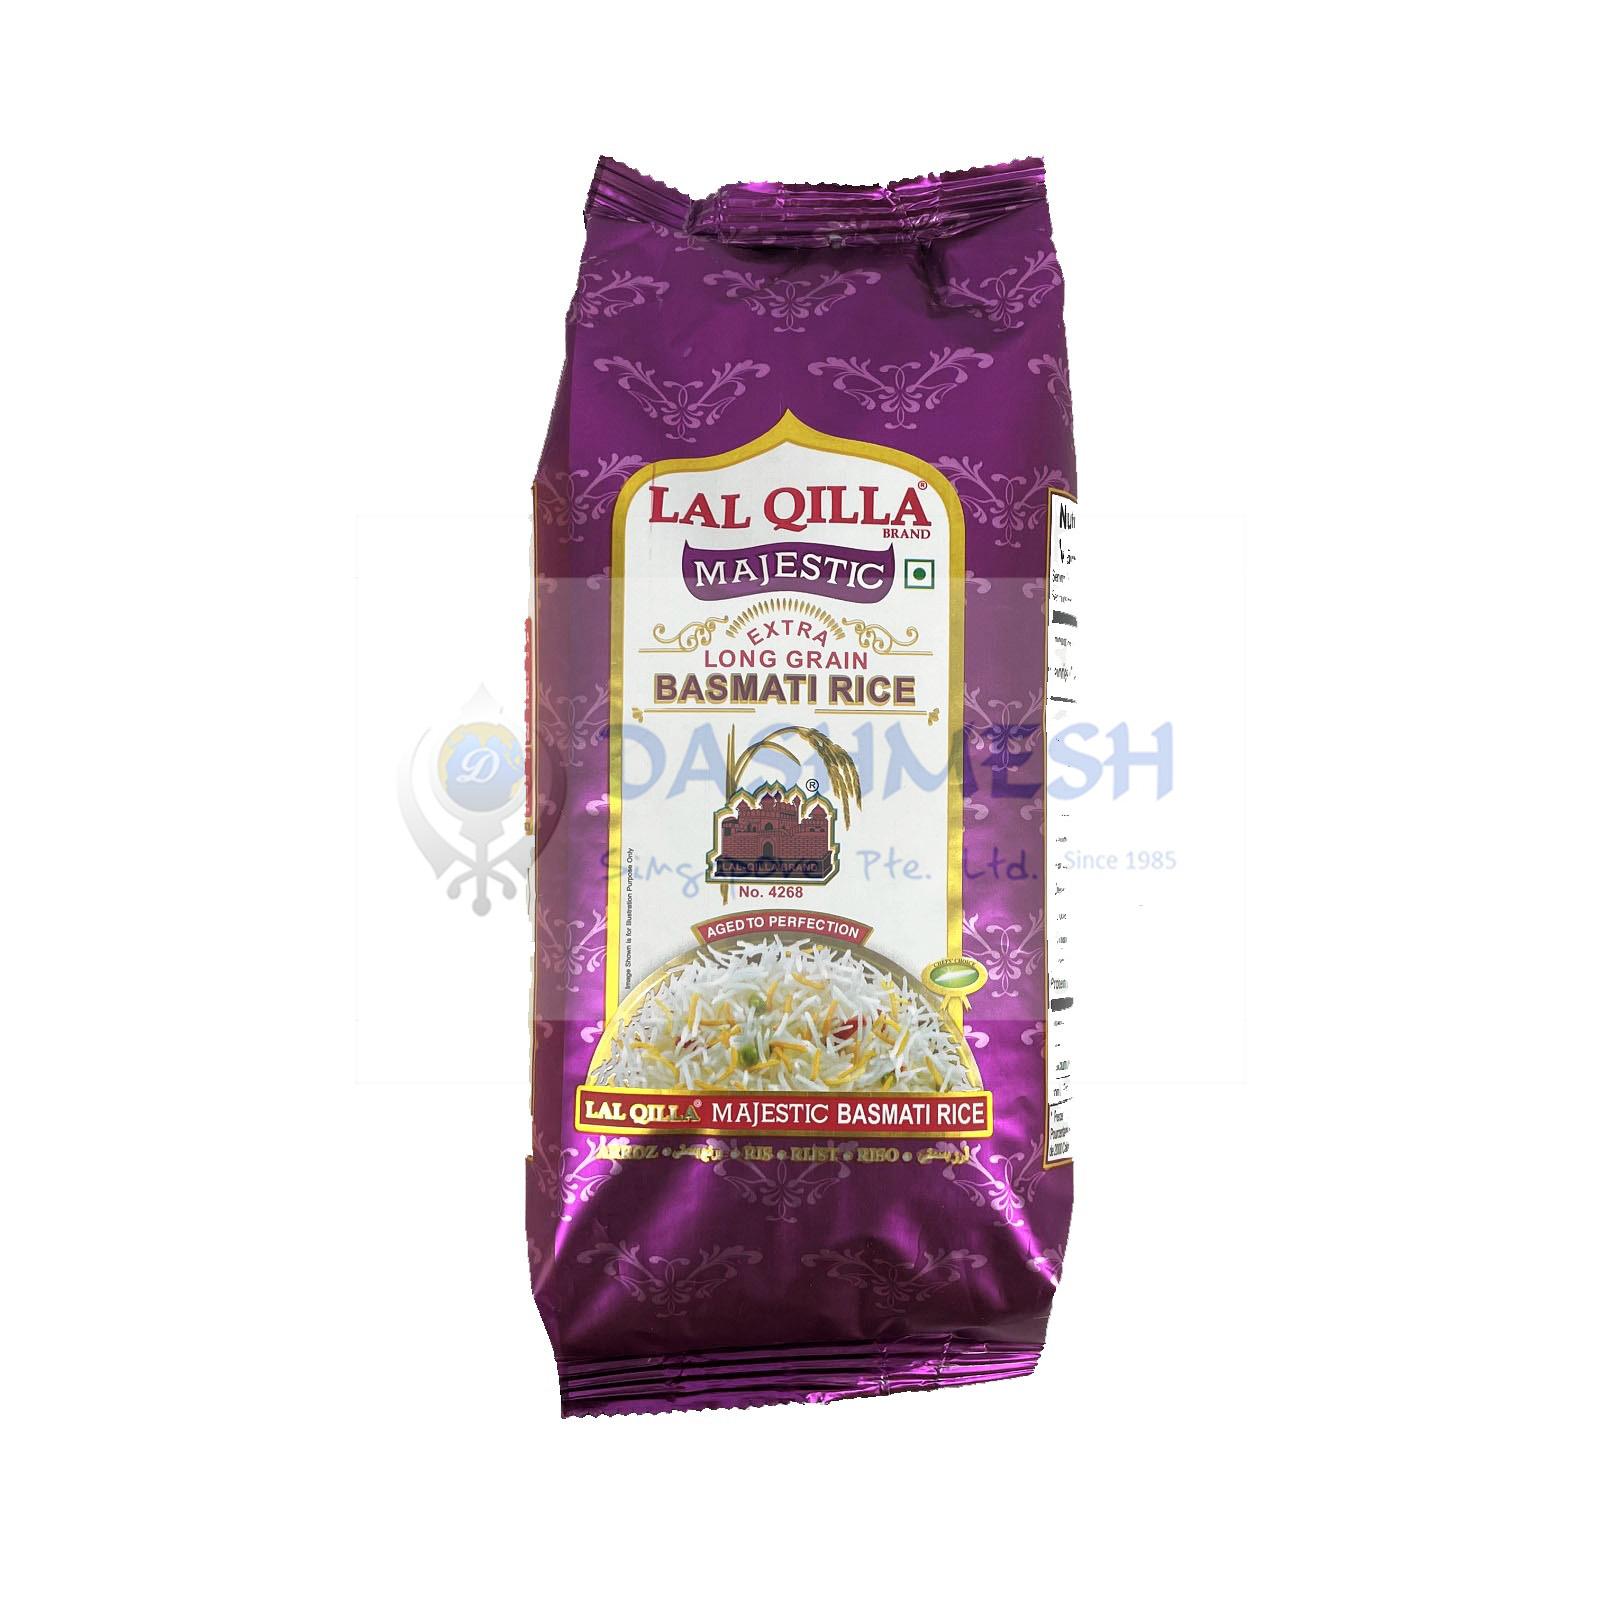 Lal Qilla Majestic Basmati Rice 1kg & 5kg